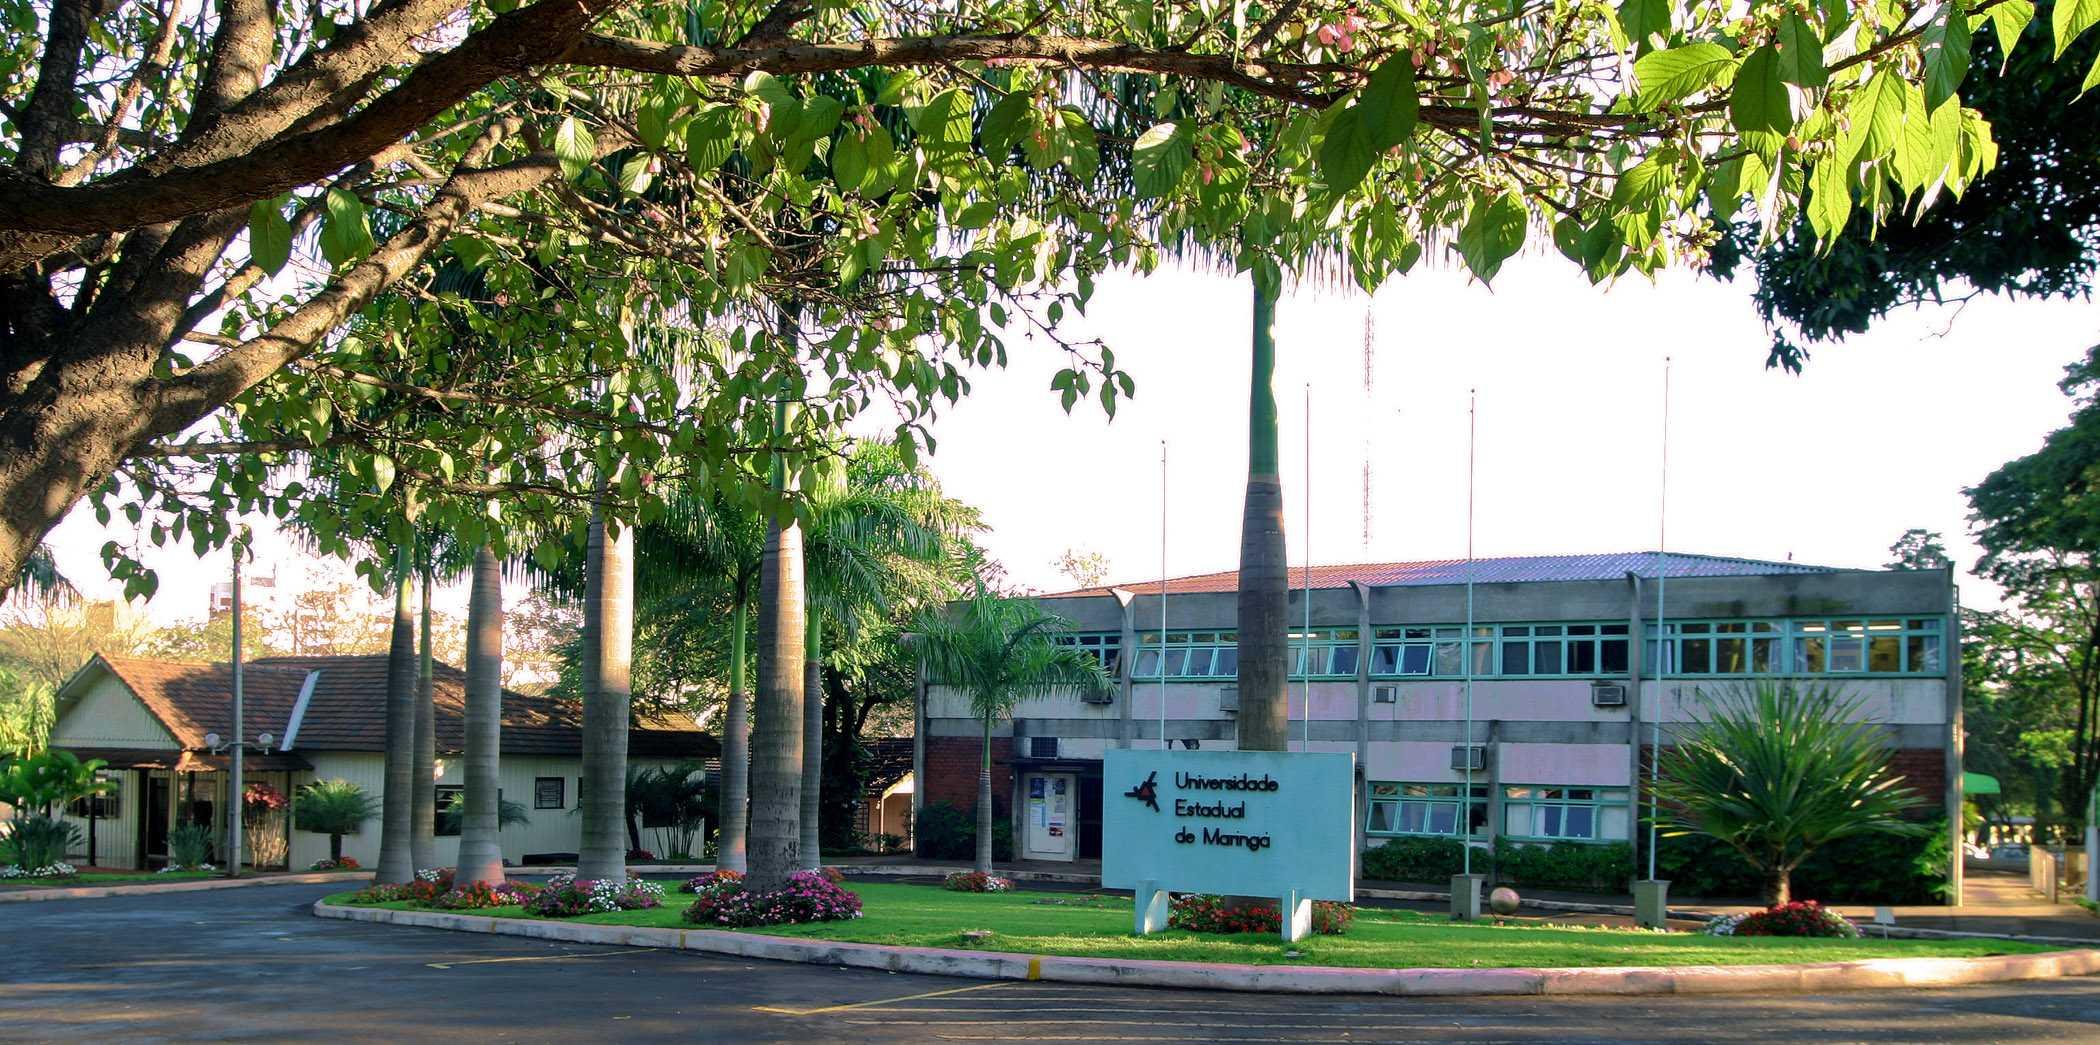 Aprovado cotas para negros nos Vestibulares da Universidade Estadual de Maringá